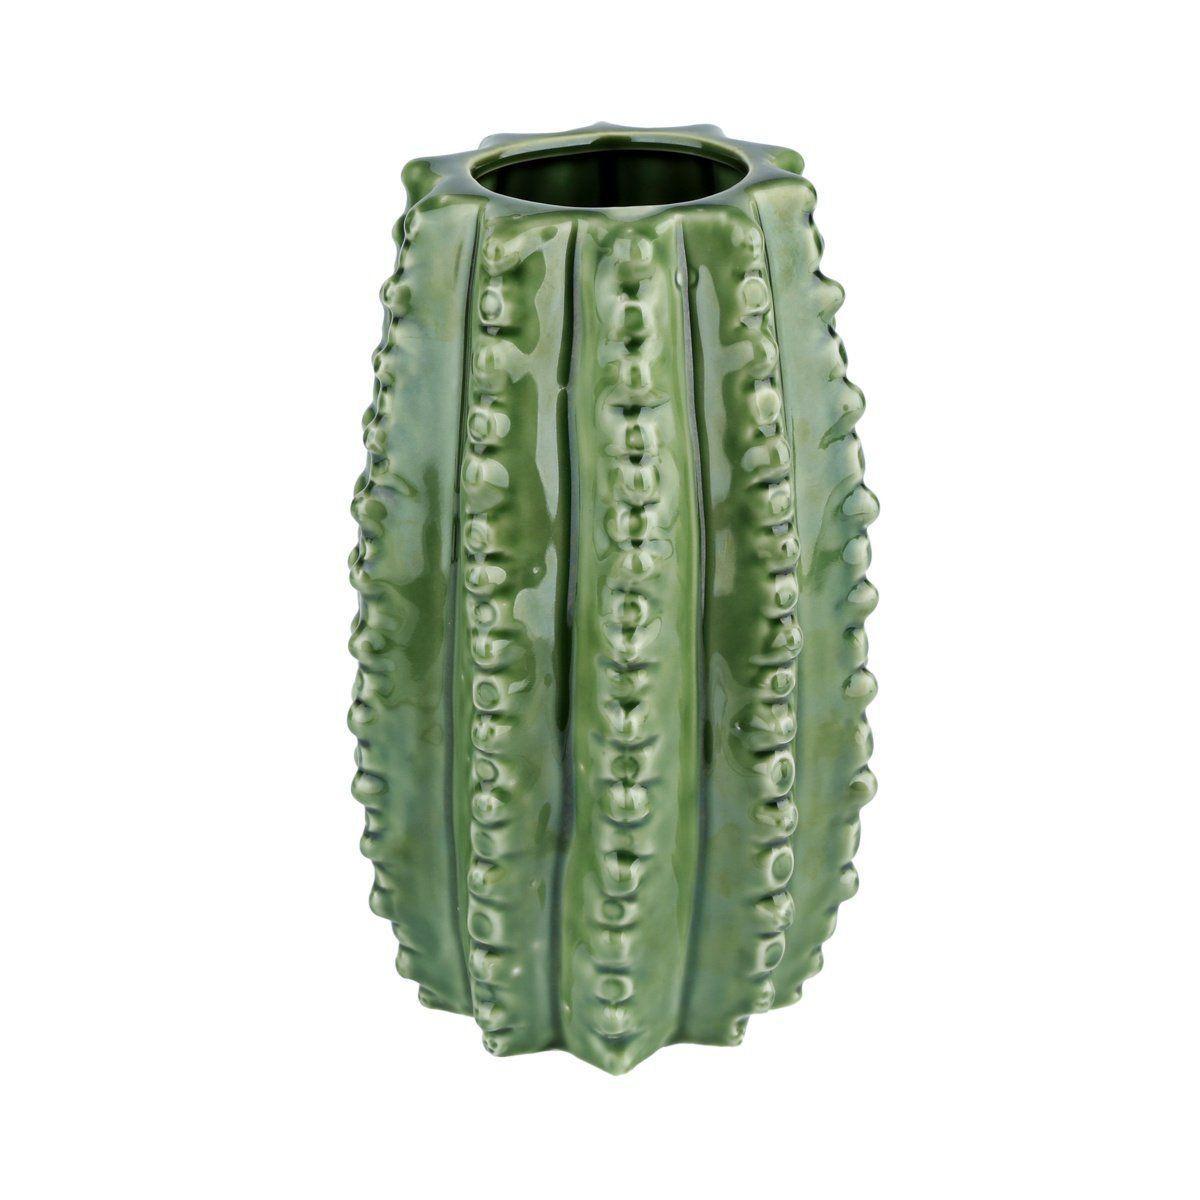 Vaso de Cerâmica Hedge Cactus Verde 20,5cm x 12,5cm - 40397